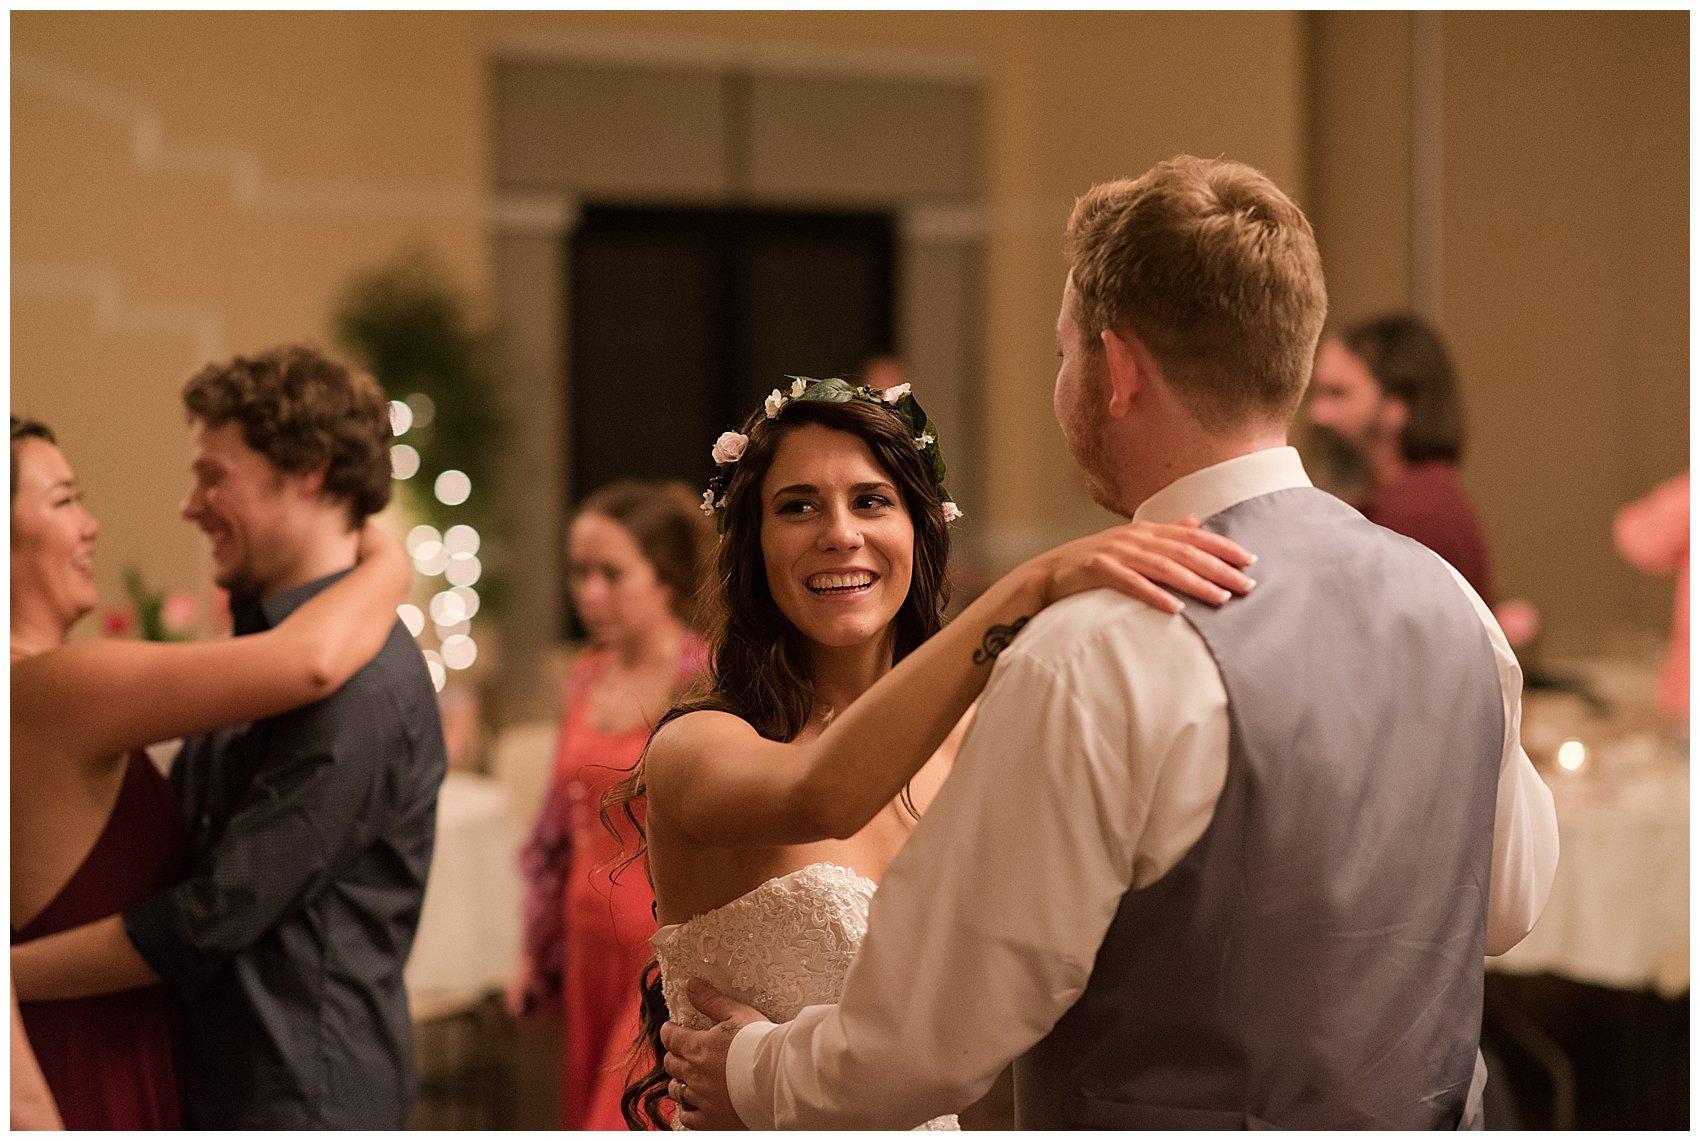 autumn-november-red-burgundy-wine-smithfield-center-wedding-virginia-wedding-photographers_3241